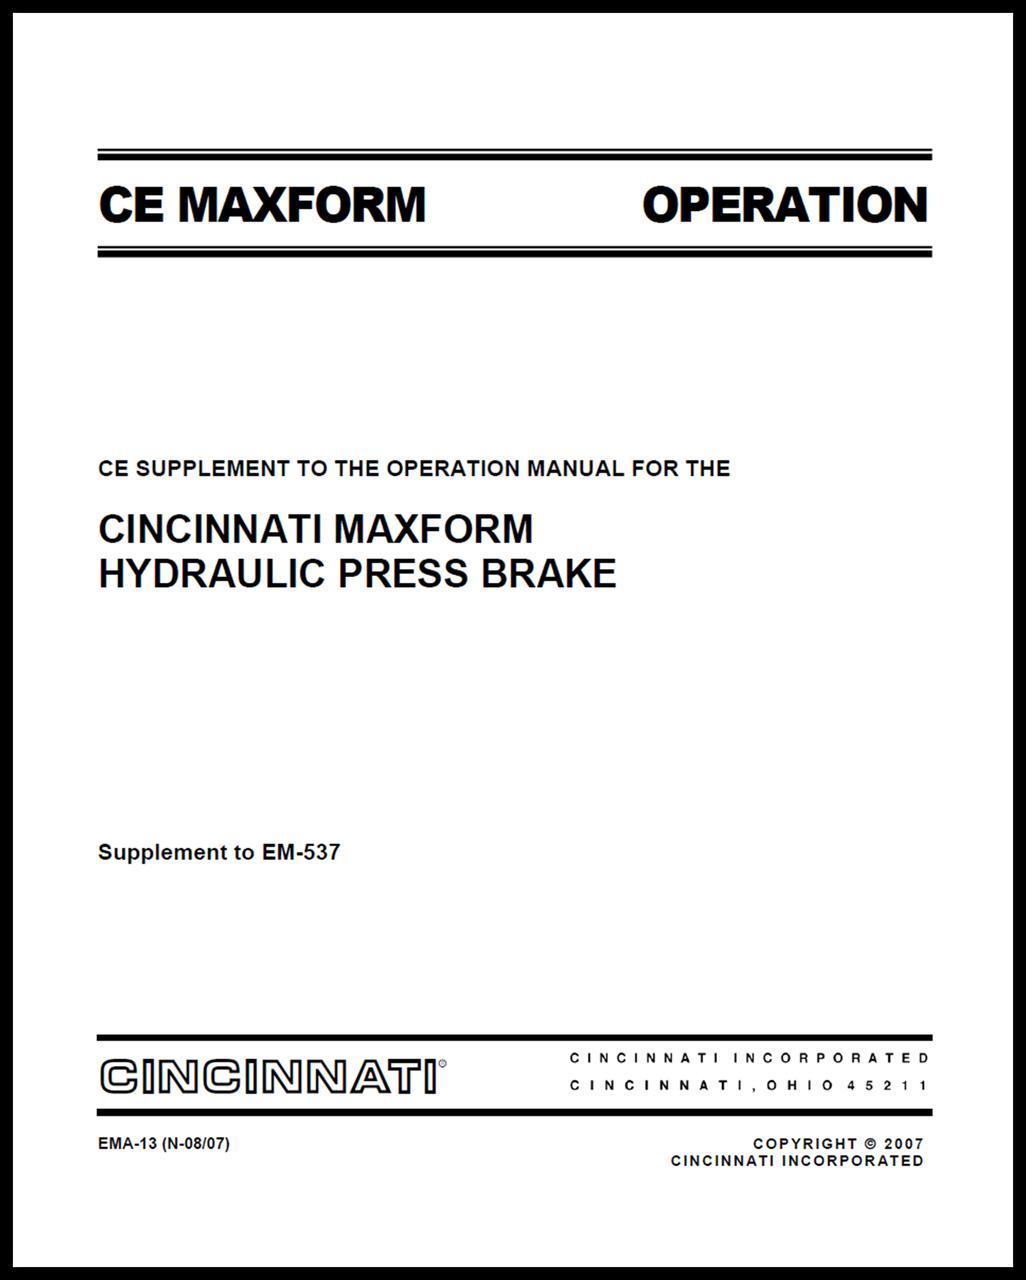 EMA-13 (N-08-07) CE SUPPLEMENT TO THE OPERATION MANUAL FOR THE CINCINNATI MAXFORM HYDRAULIC PRESS BRAKE EM-537